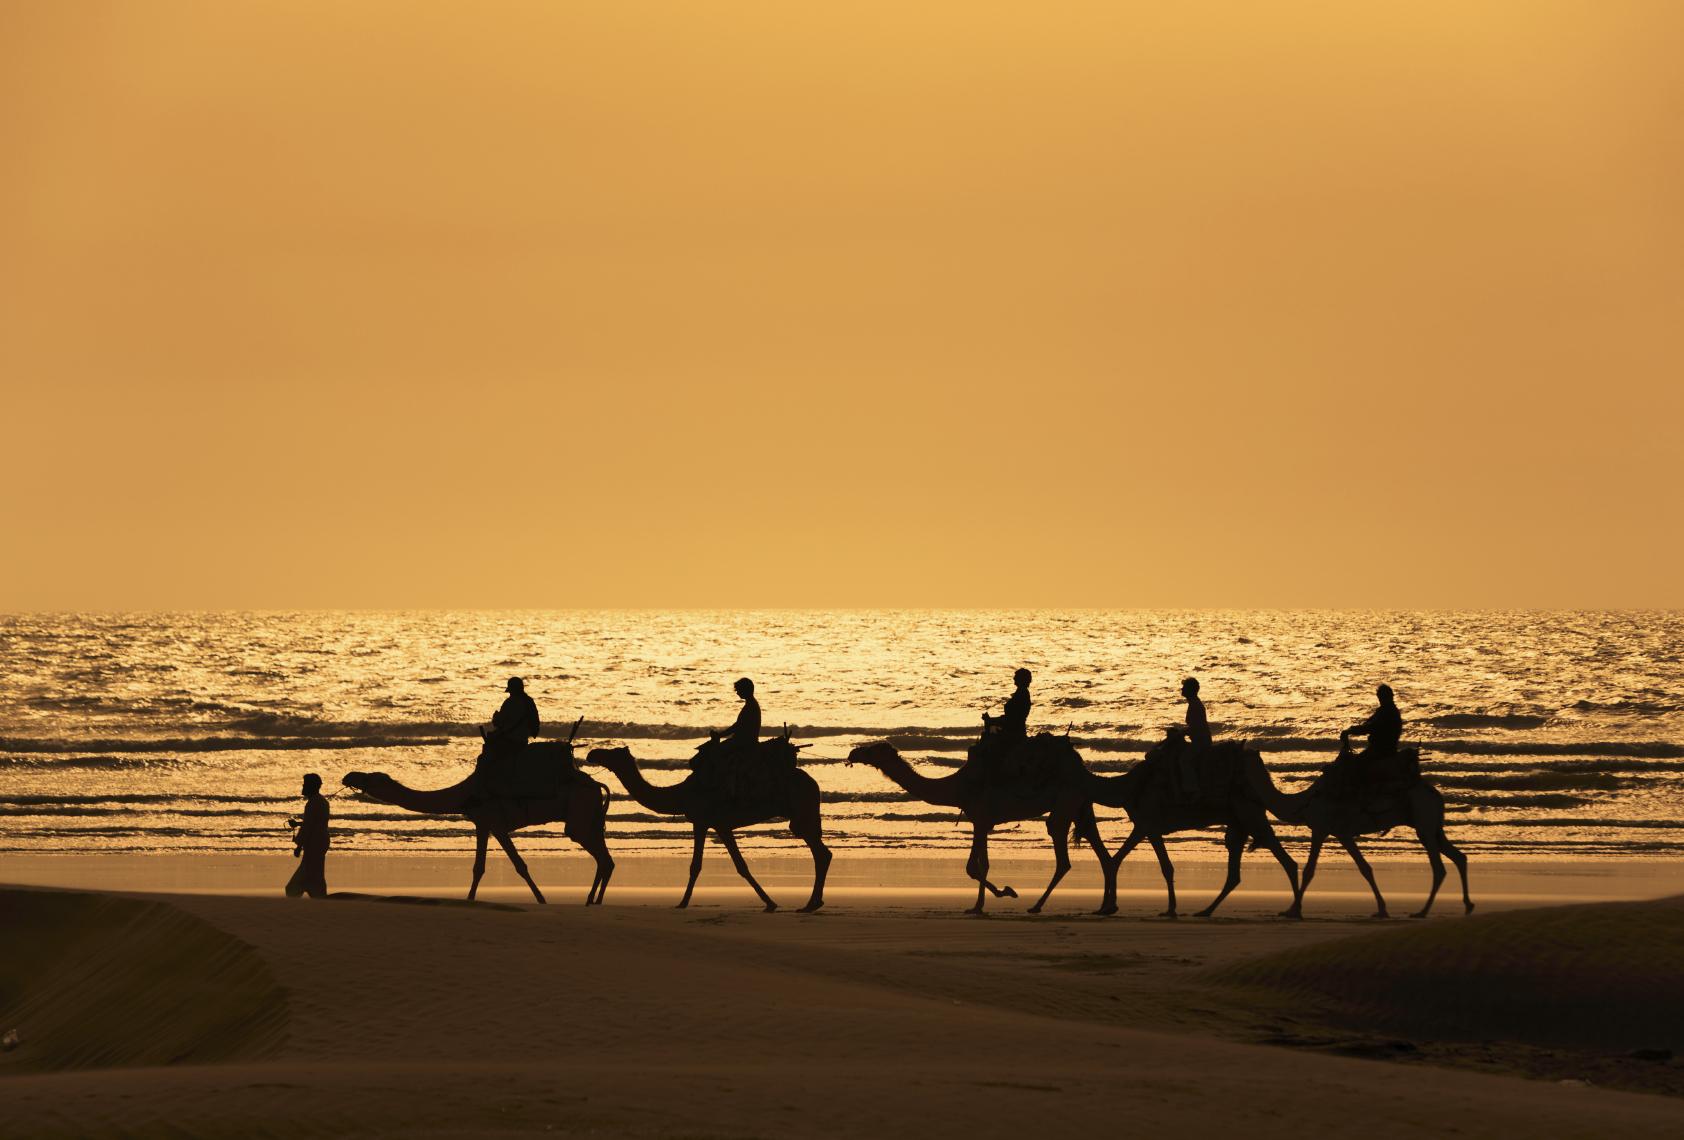 Camel ride canary islands